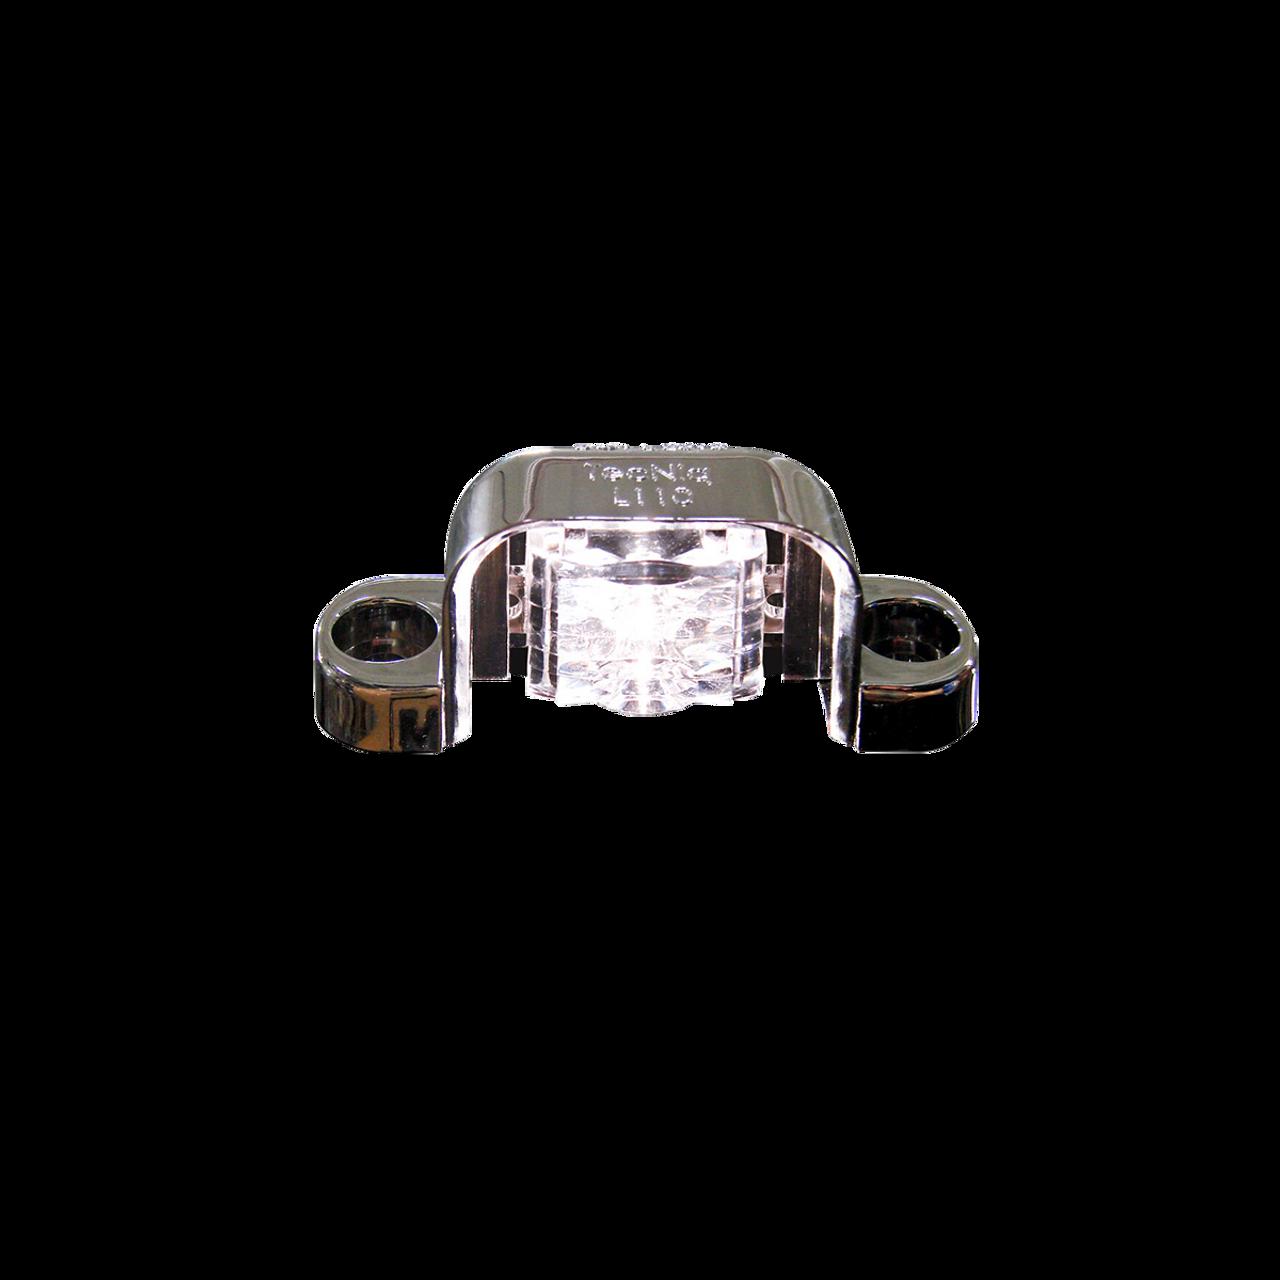 LEDL11C1 --- LED Sealed License Light